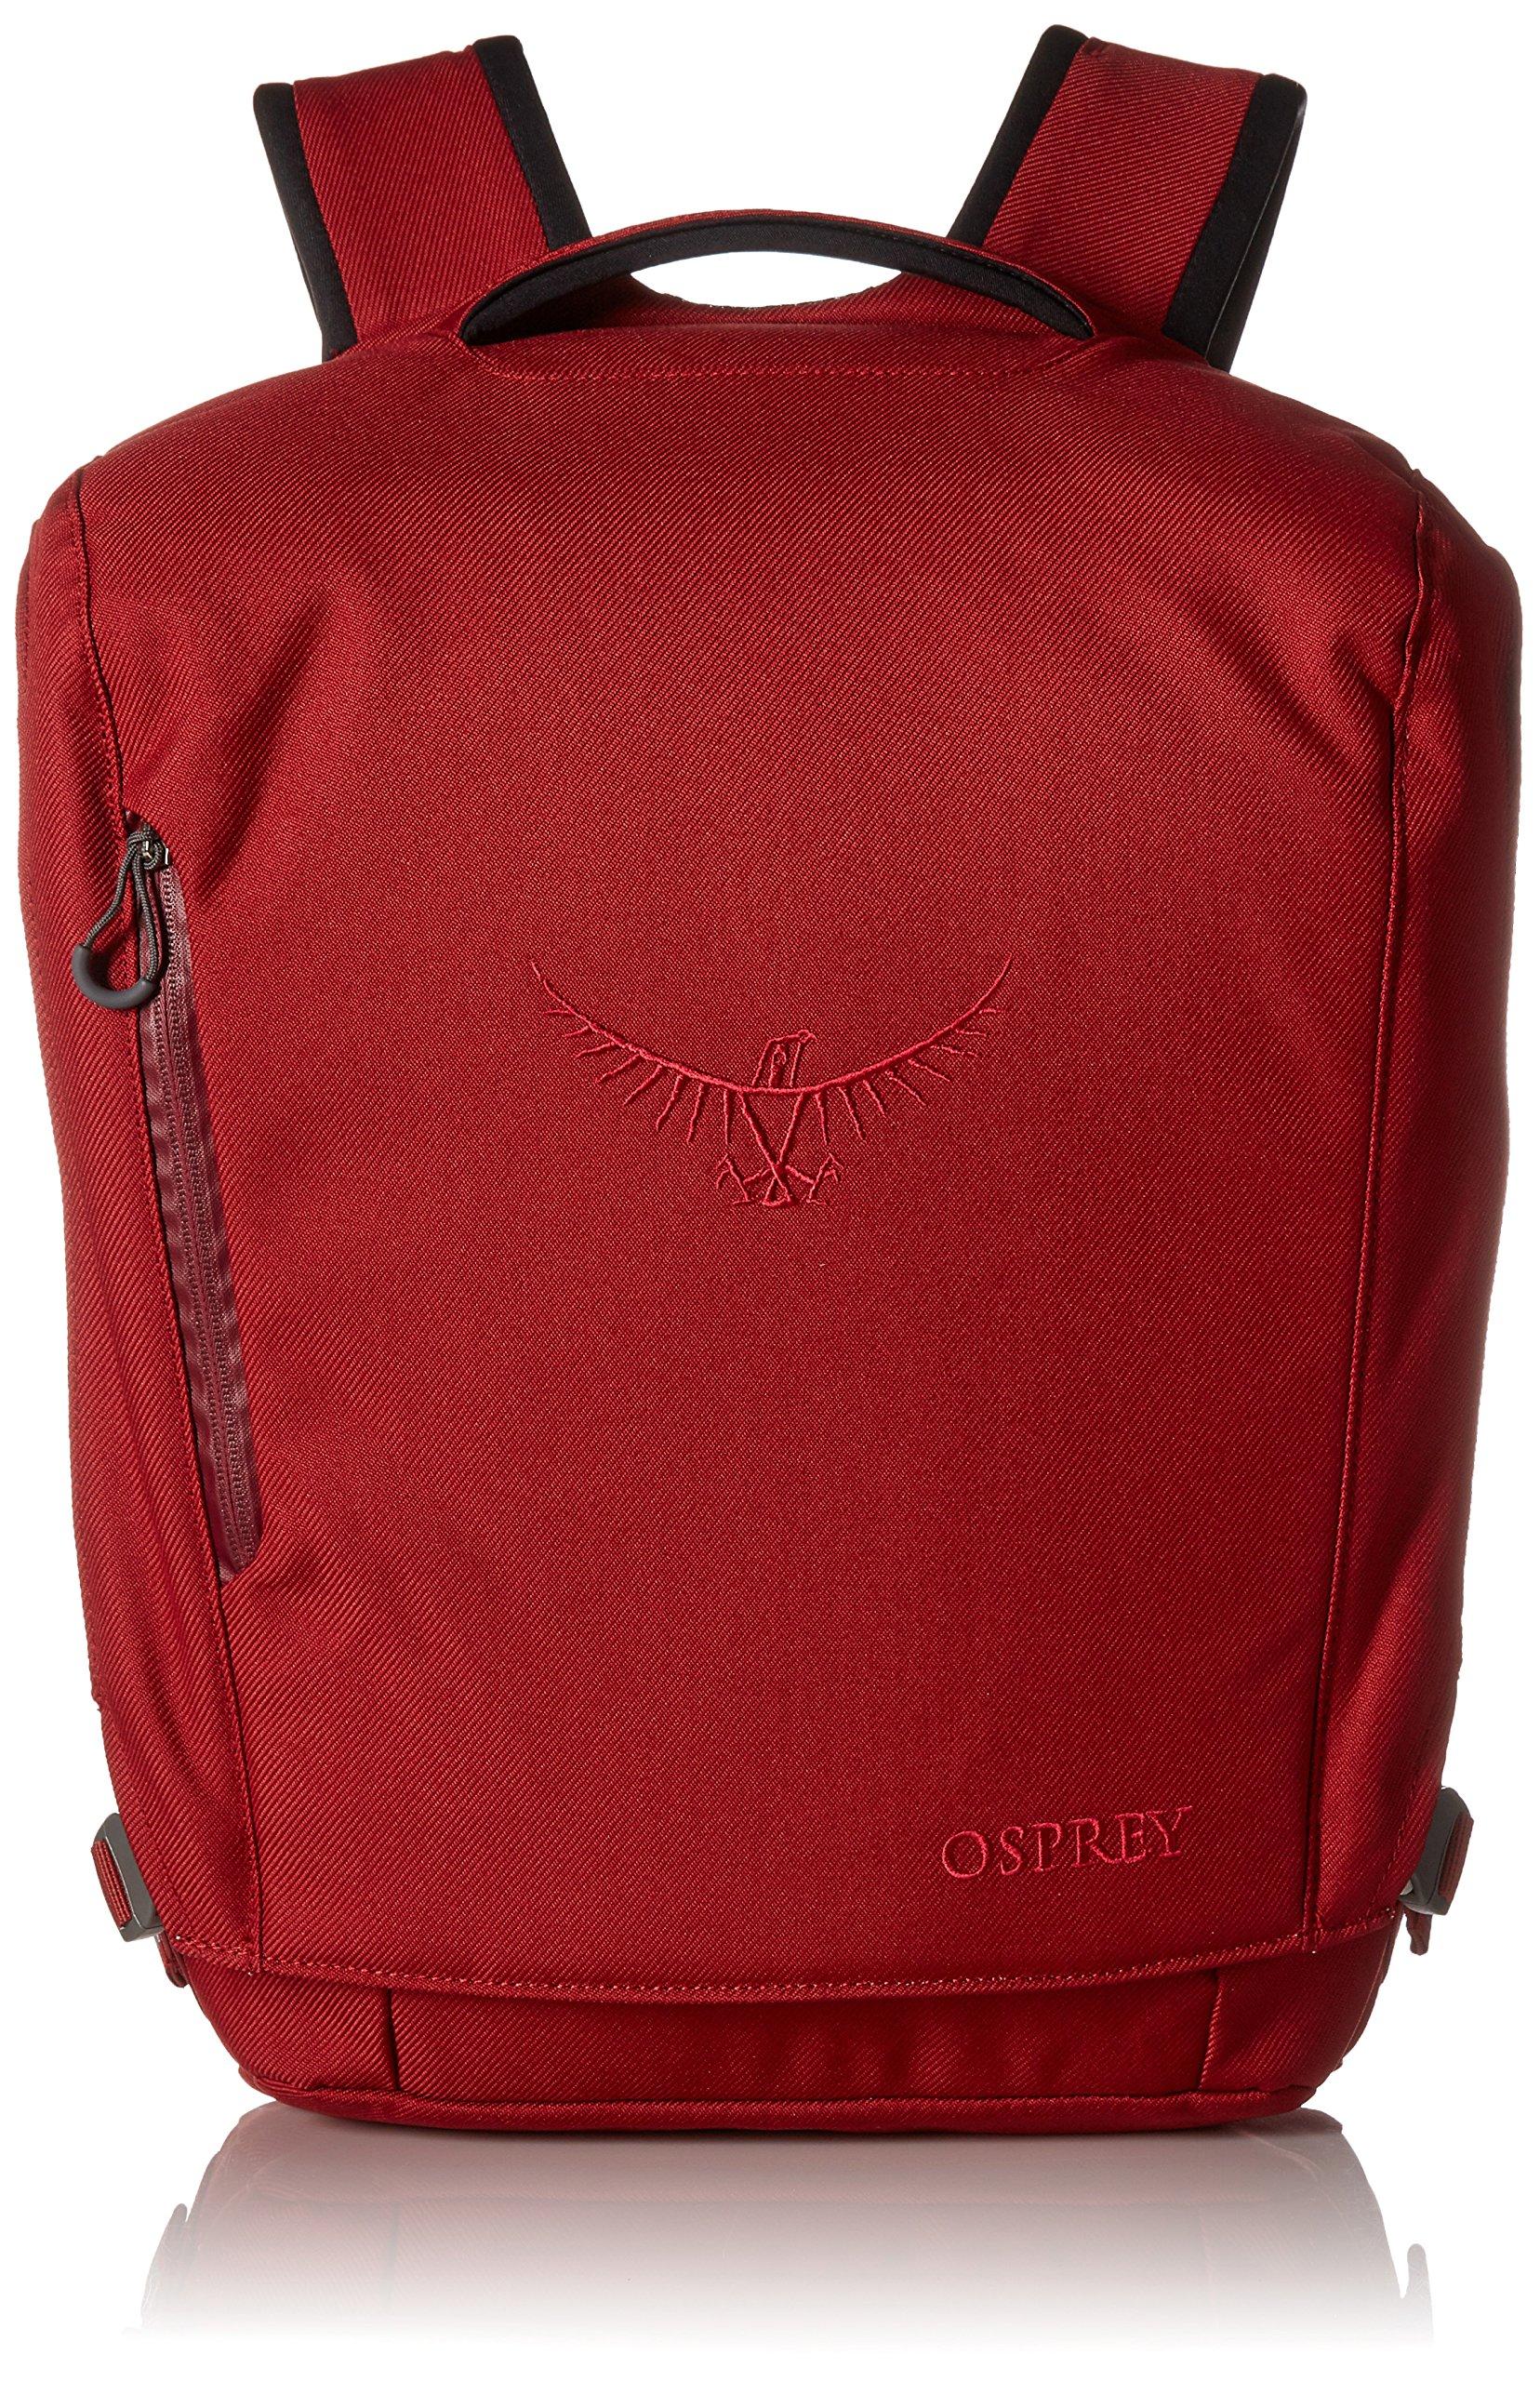 Osprey Packs Pixel Port Daypack, Pinot Red